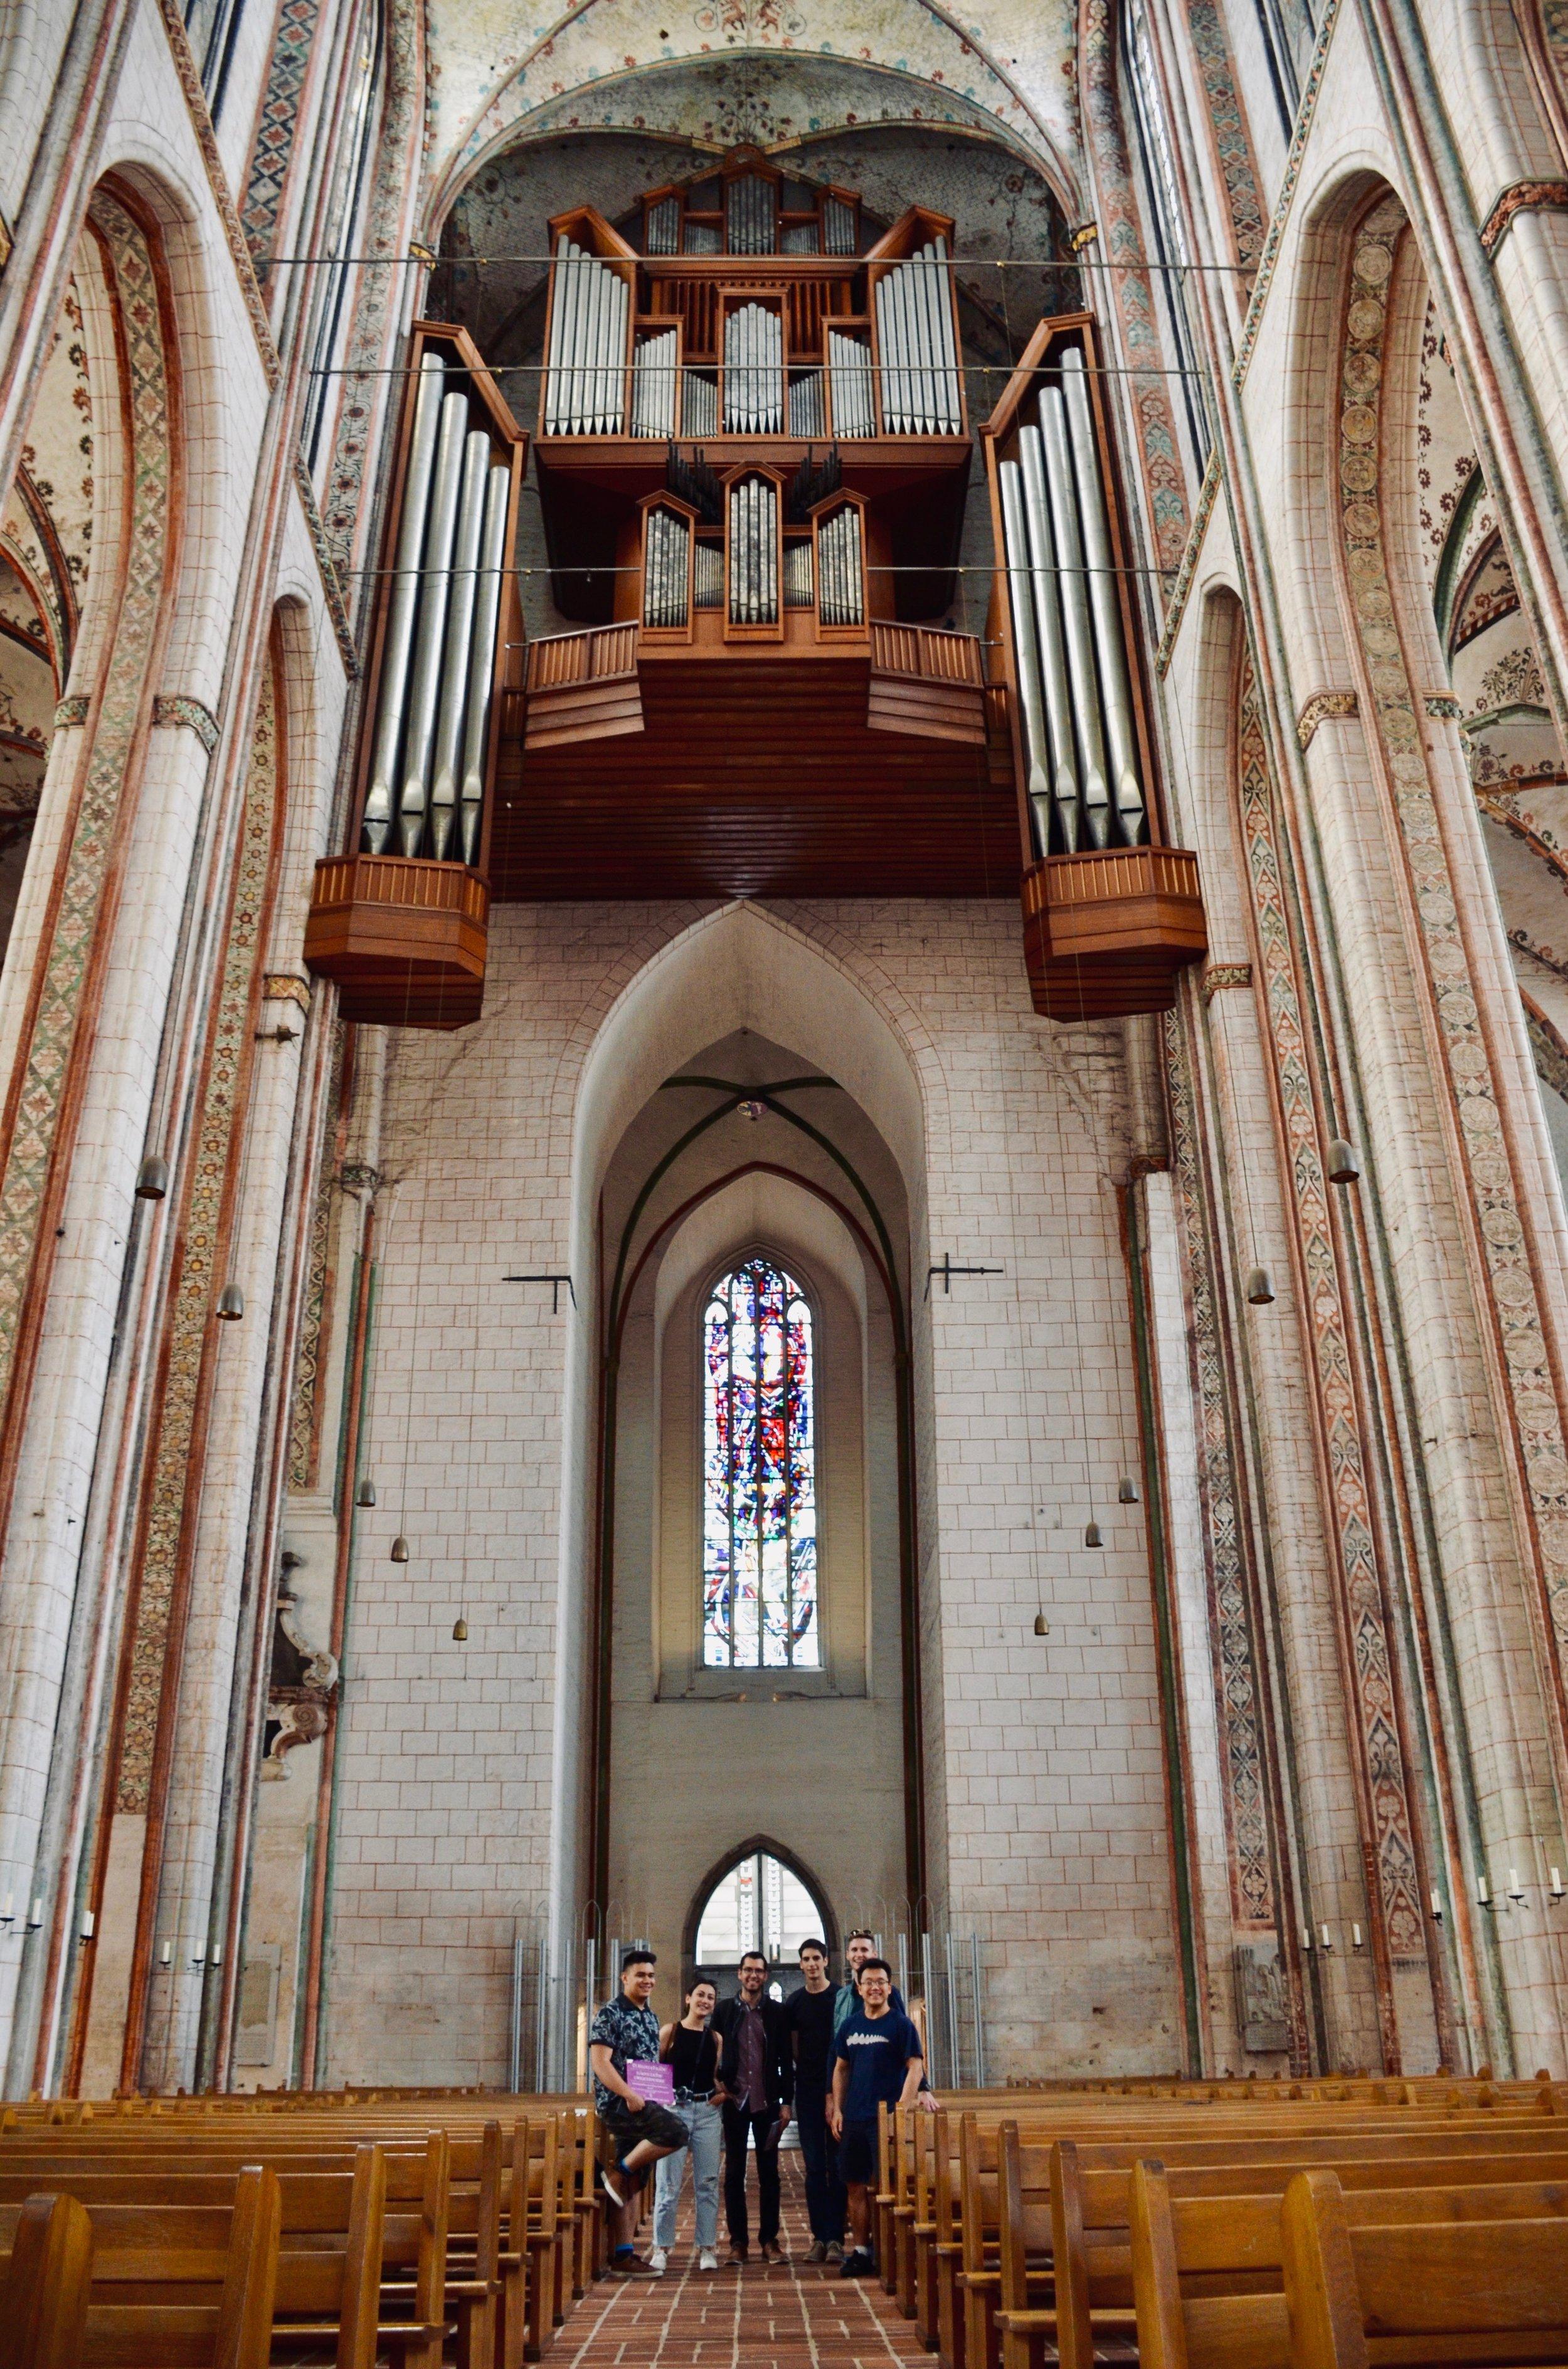 Members of Boston Organ Studio in Marienkirche, Lübeck.